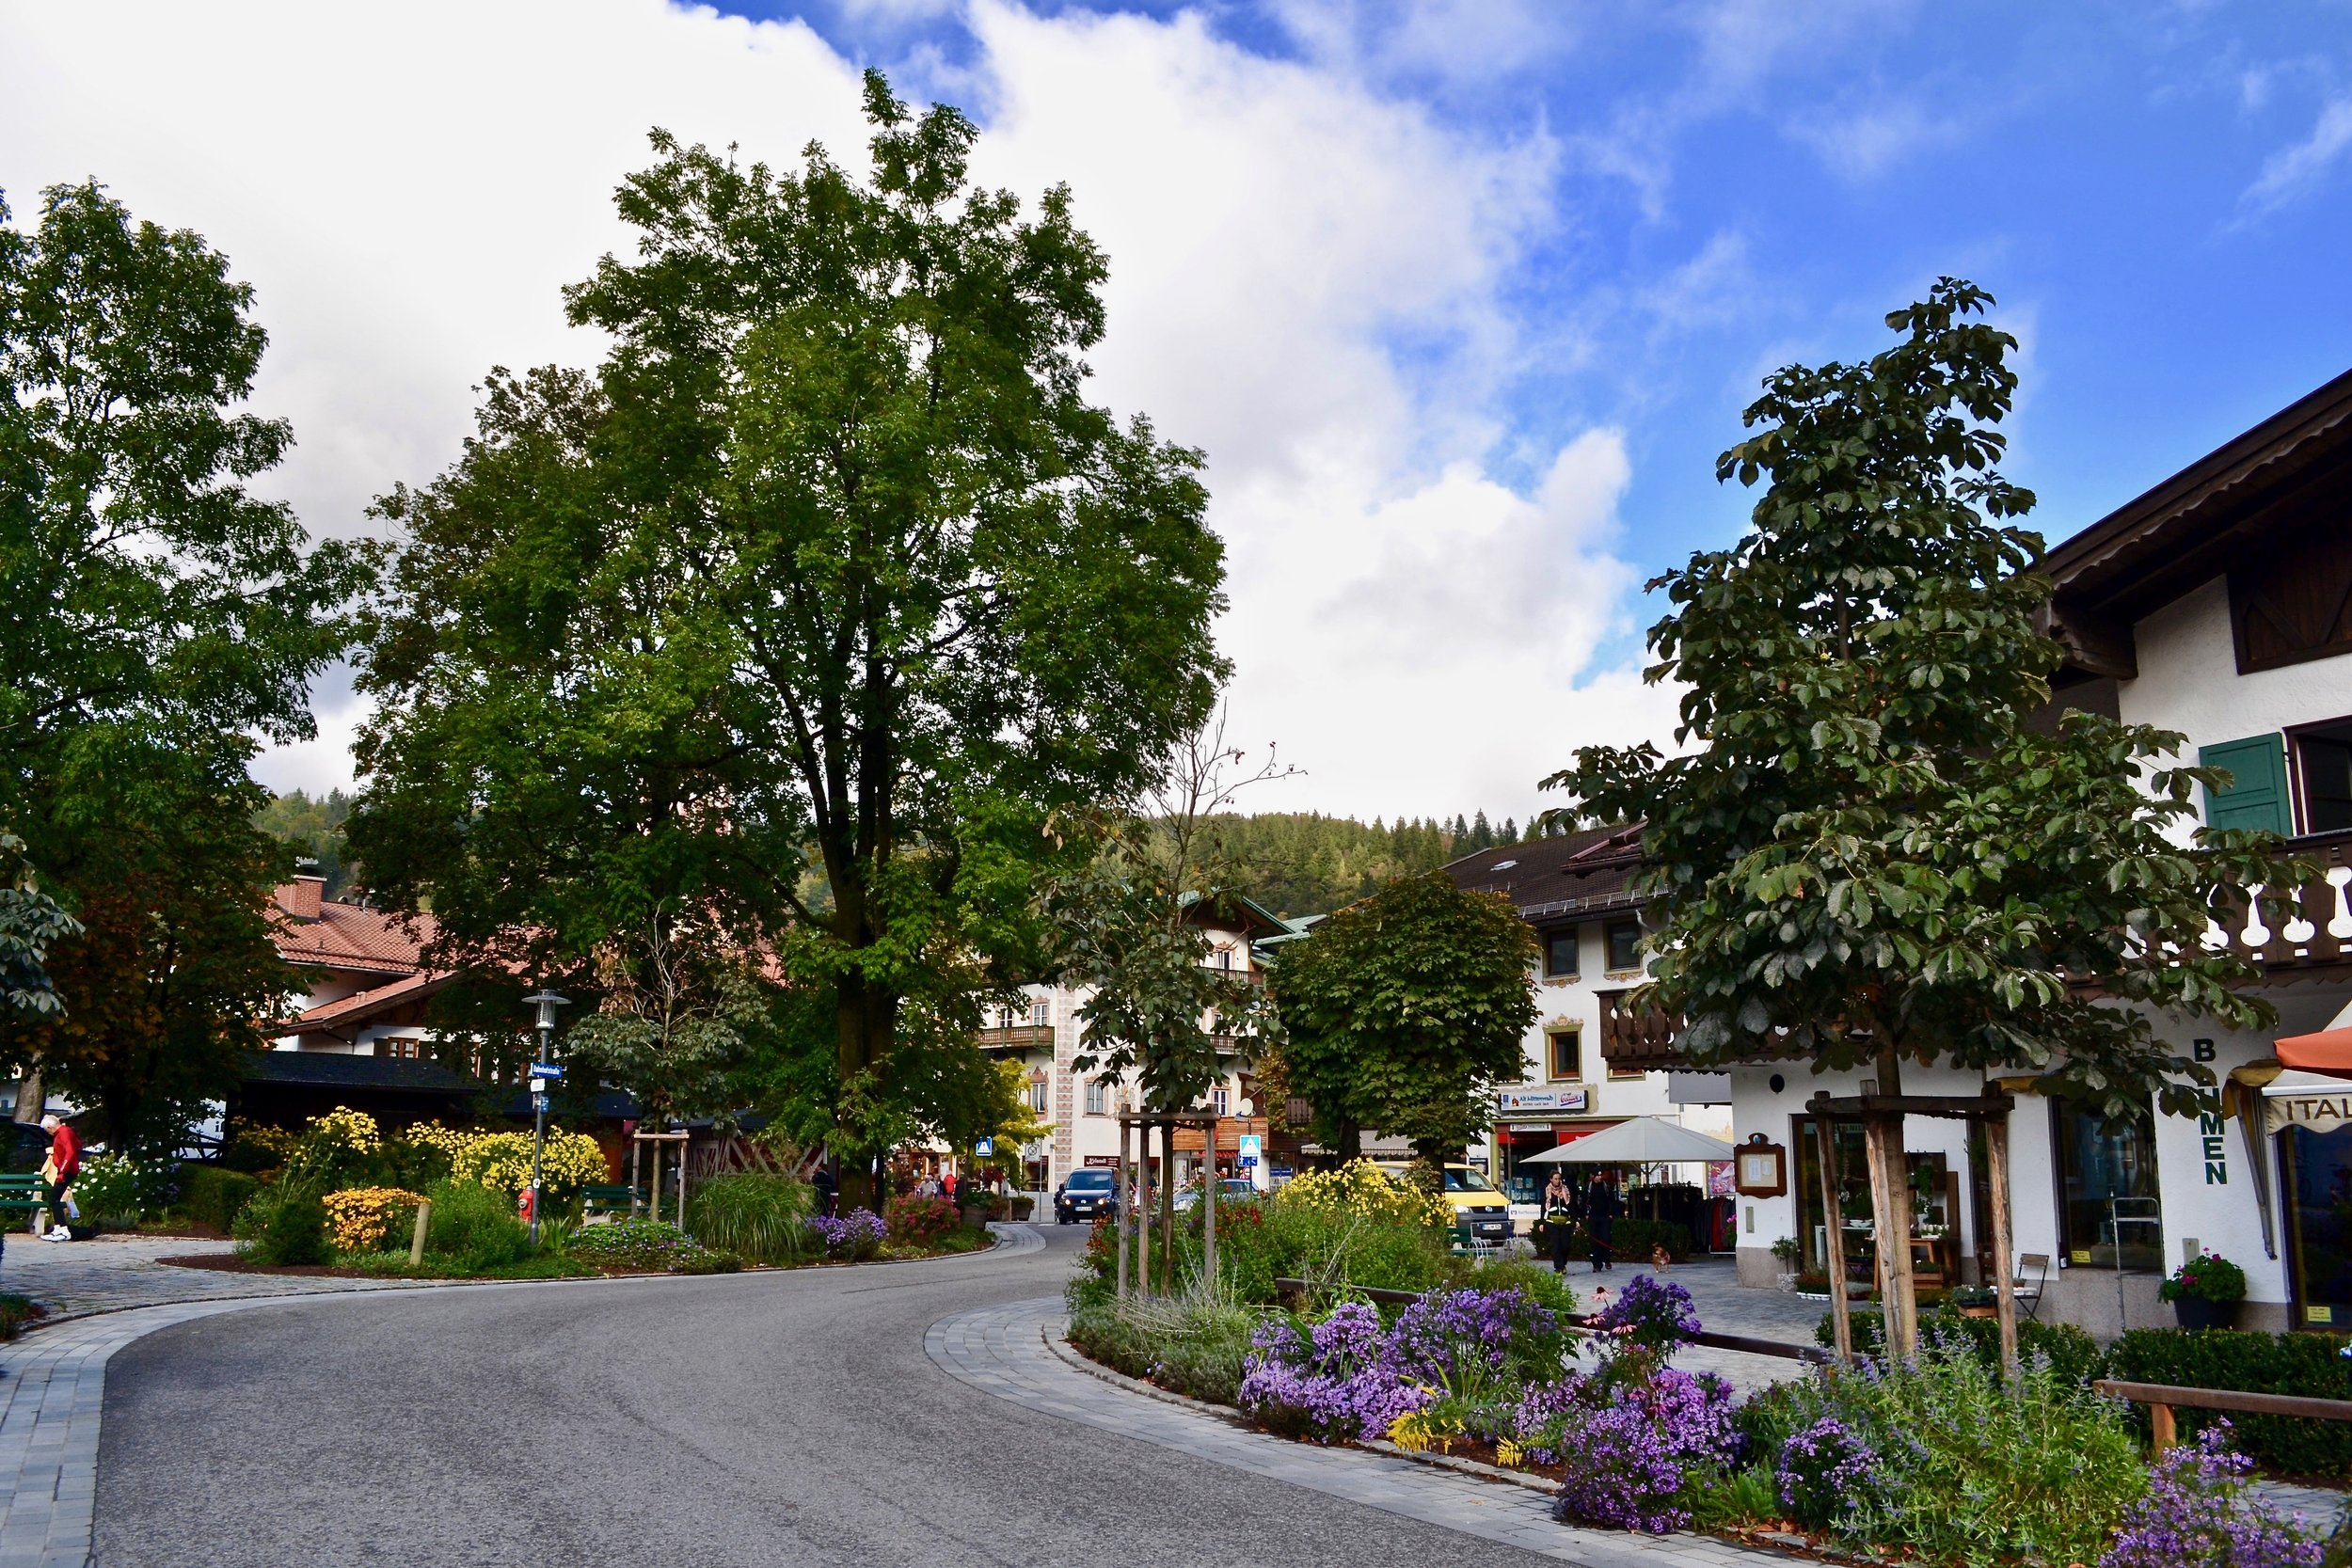 Mittenwald Main Street